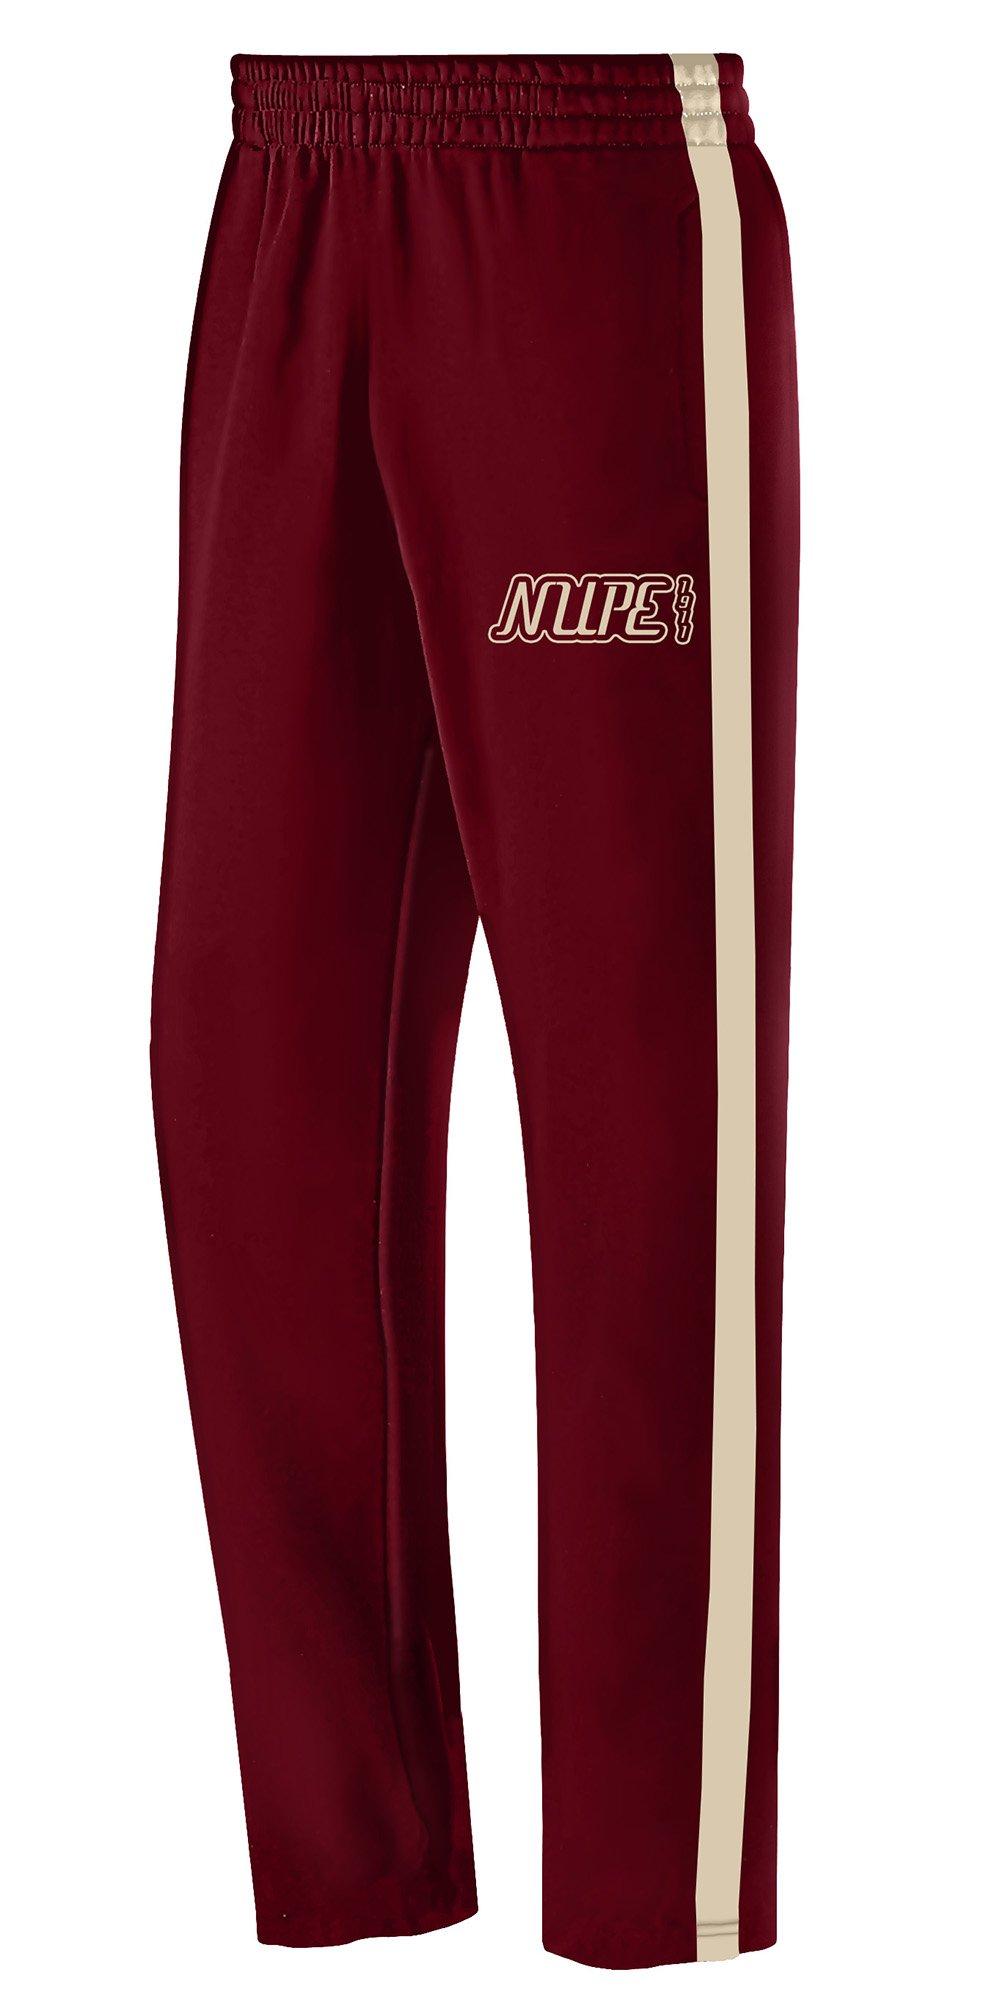 Image of Track Pants (Wide Stripe) - Crimson